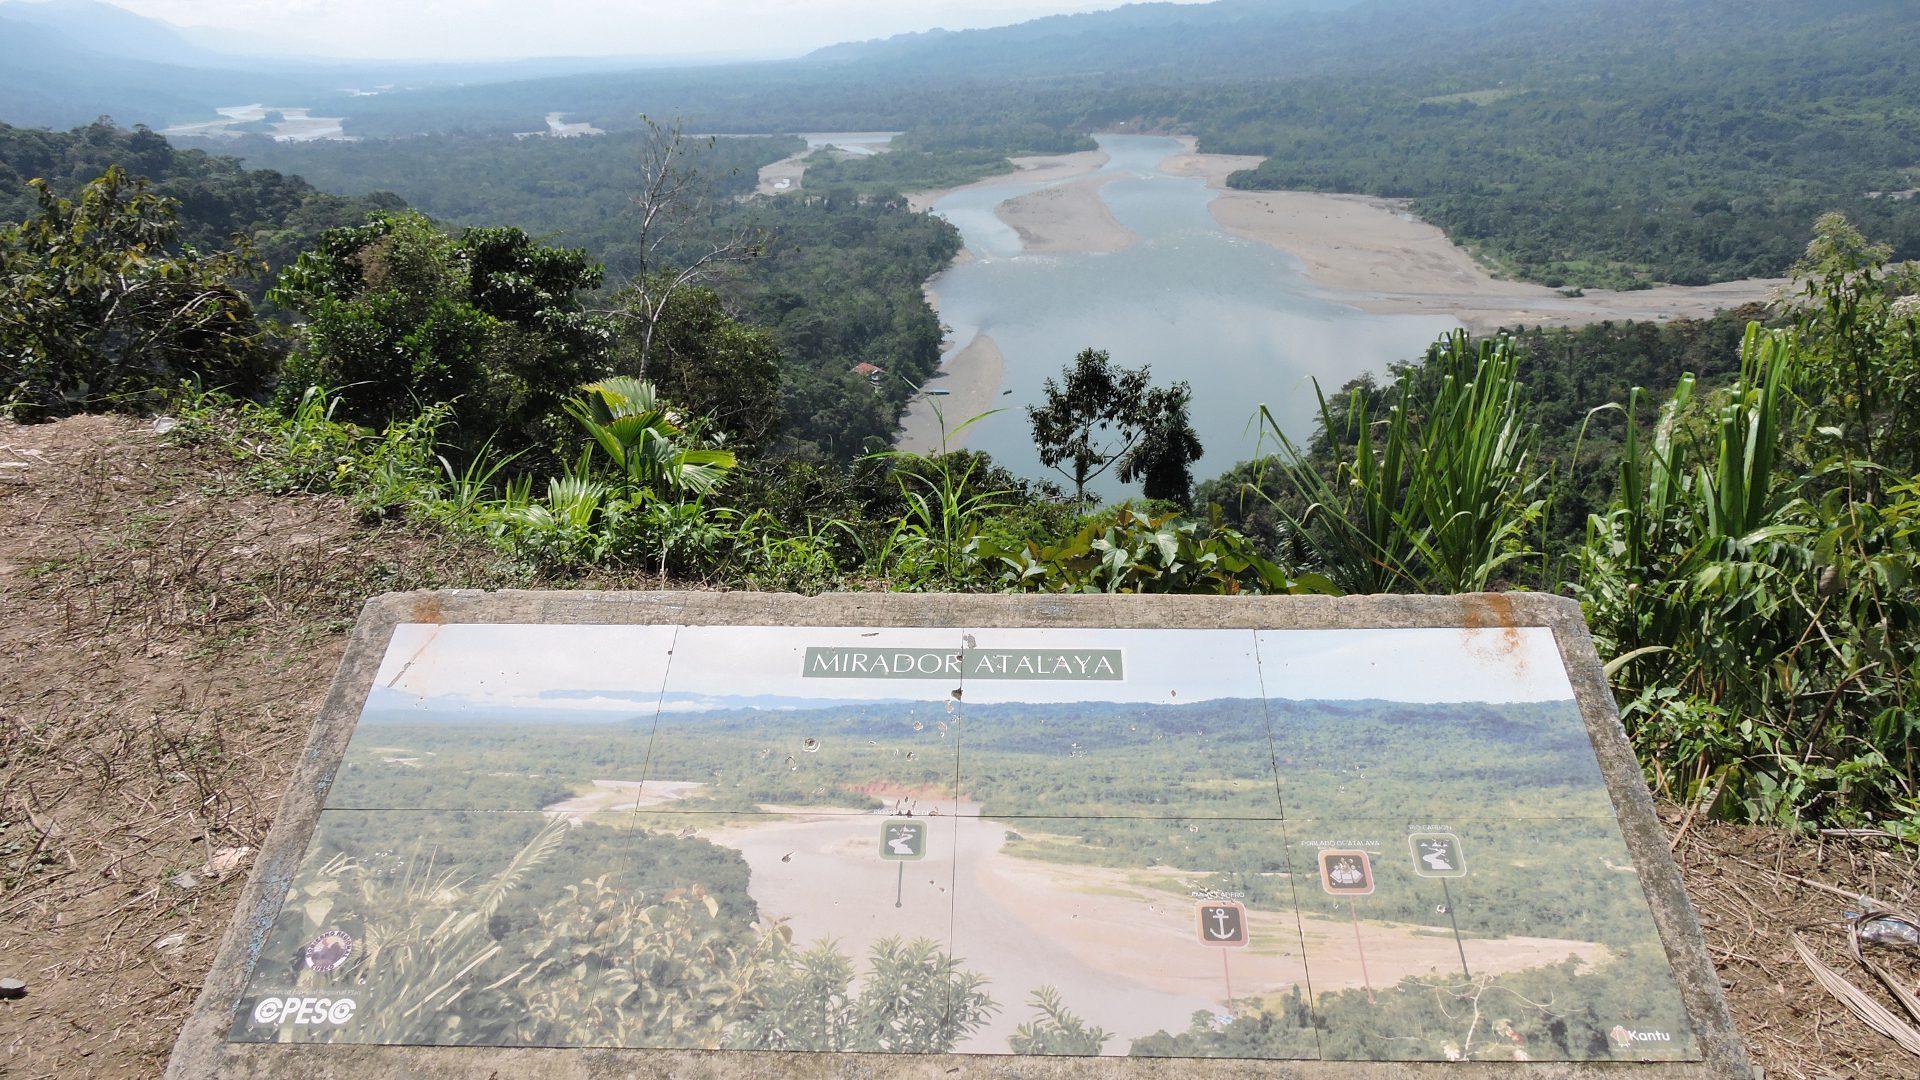 Atalaya's viewpoint over the Alto Madre de Dios river   Responsible Travel Peru